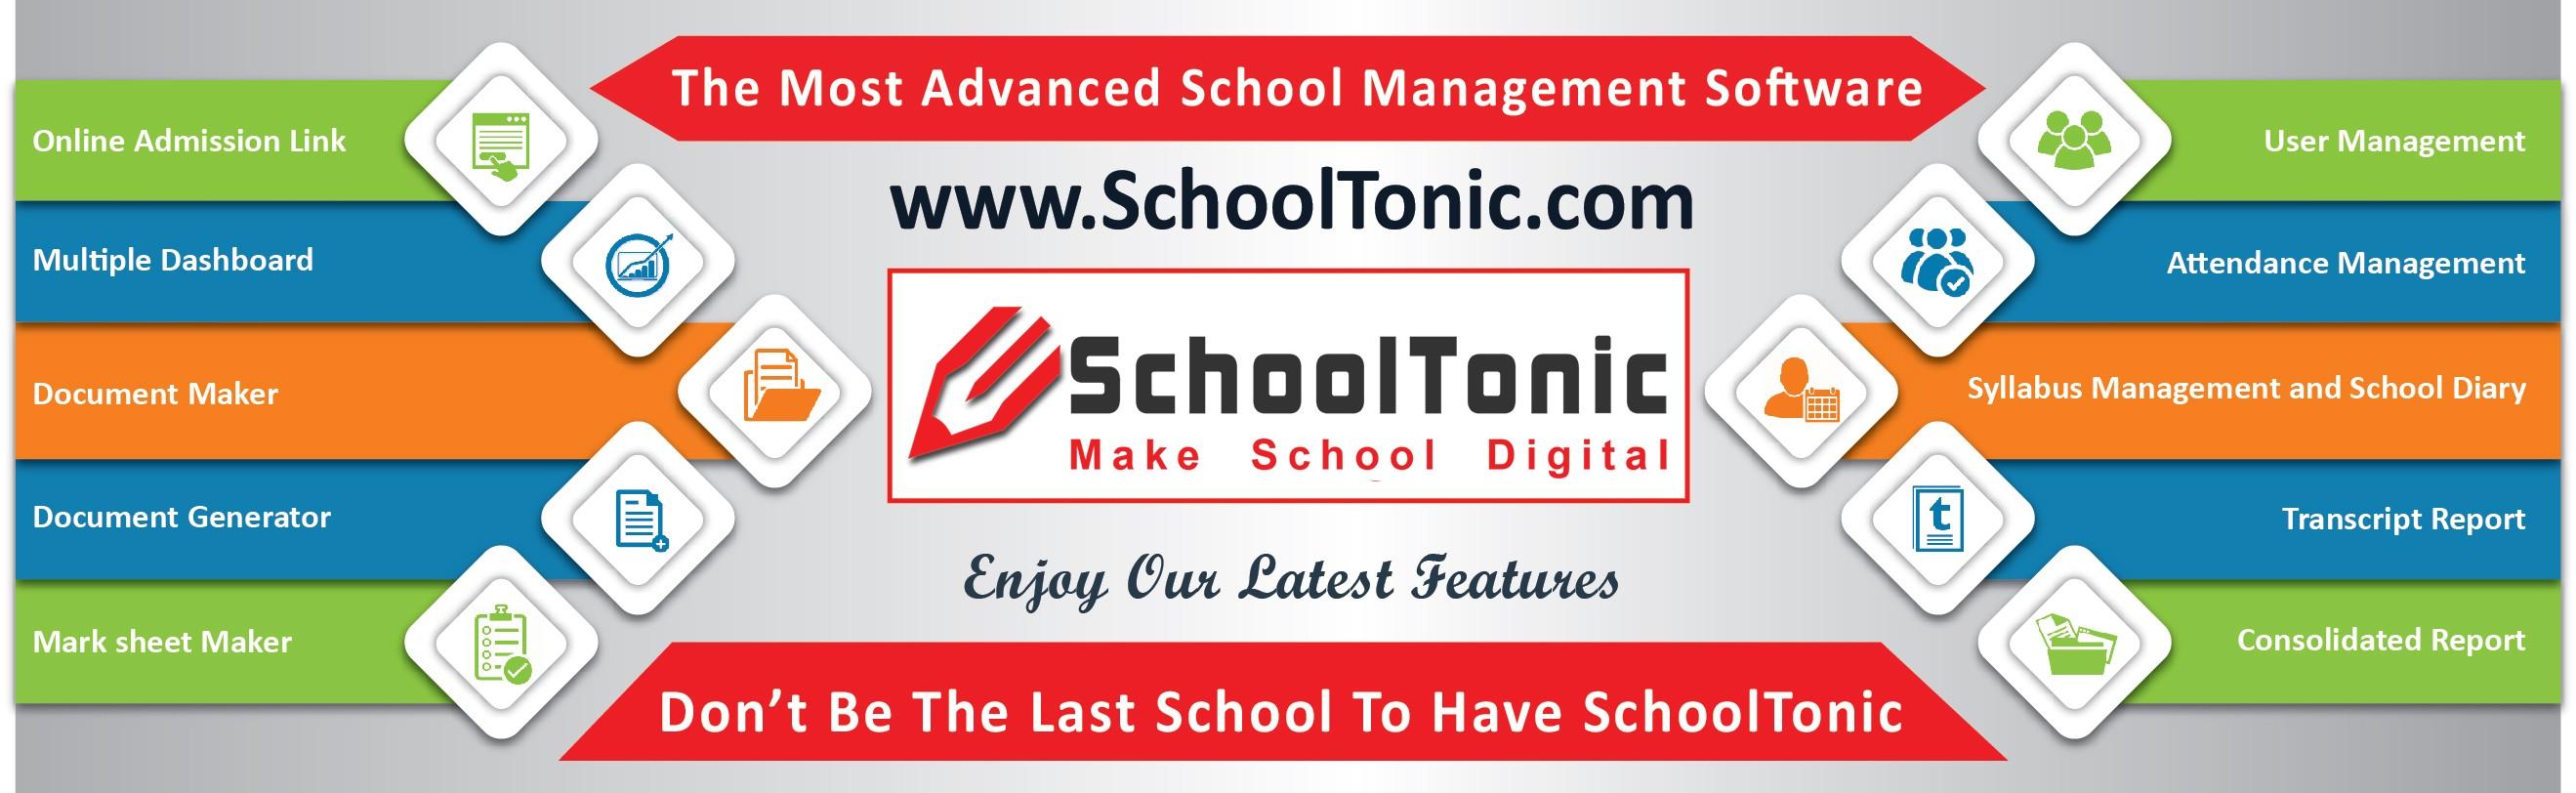 Shahidoon Softech Pvt  Ltd  | LinkedIn